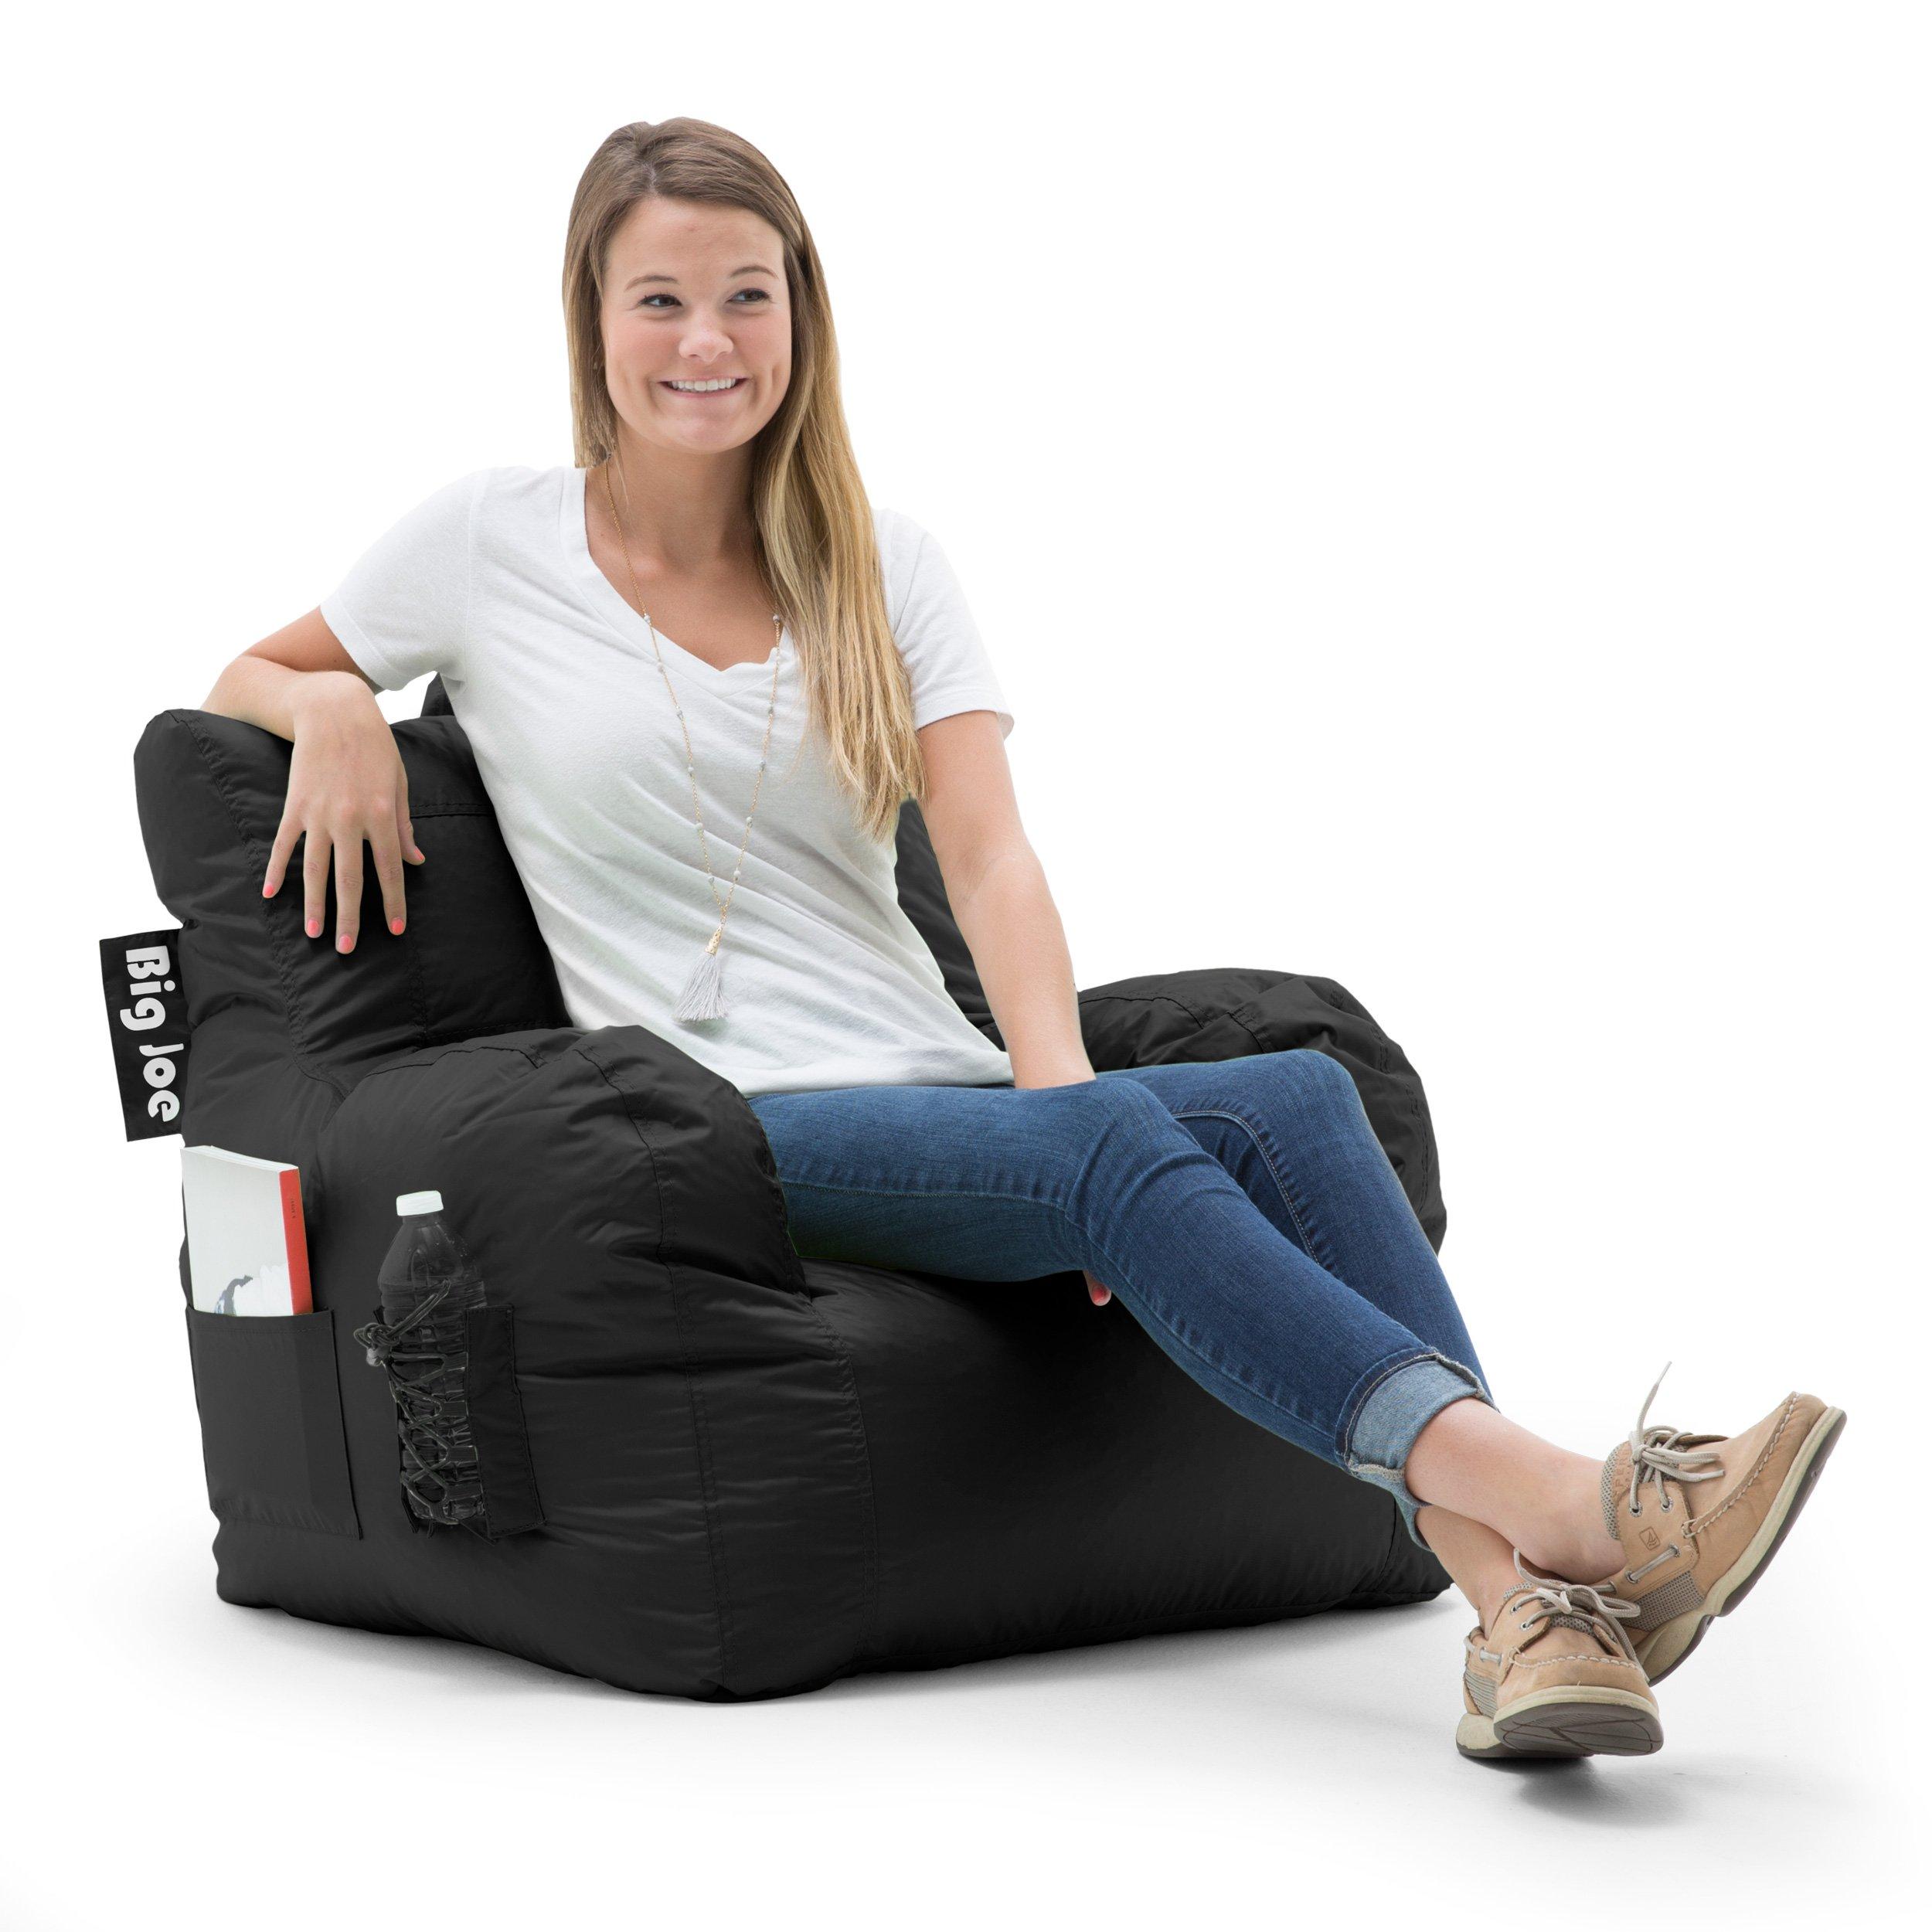 Big Joe 645602 Dorm Bean Bag Chair, Stretch Limo Black